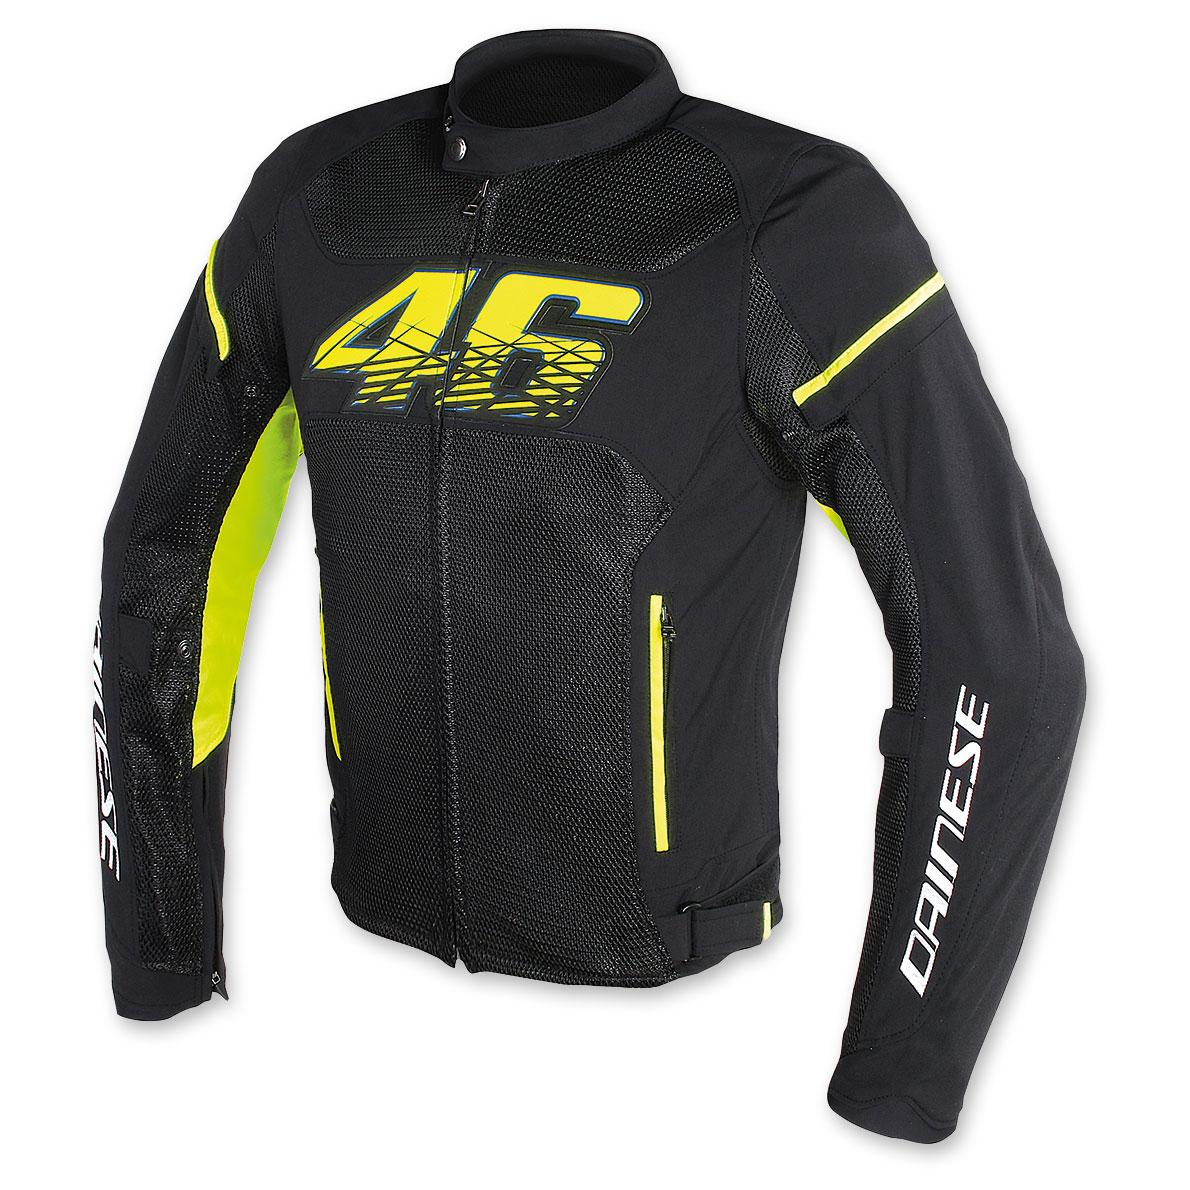 Dainese Men's VR46 D1 Air Black/Yellow Textile Jacket